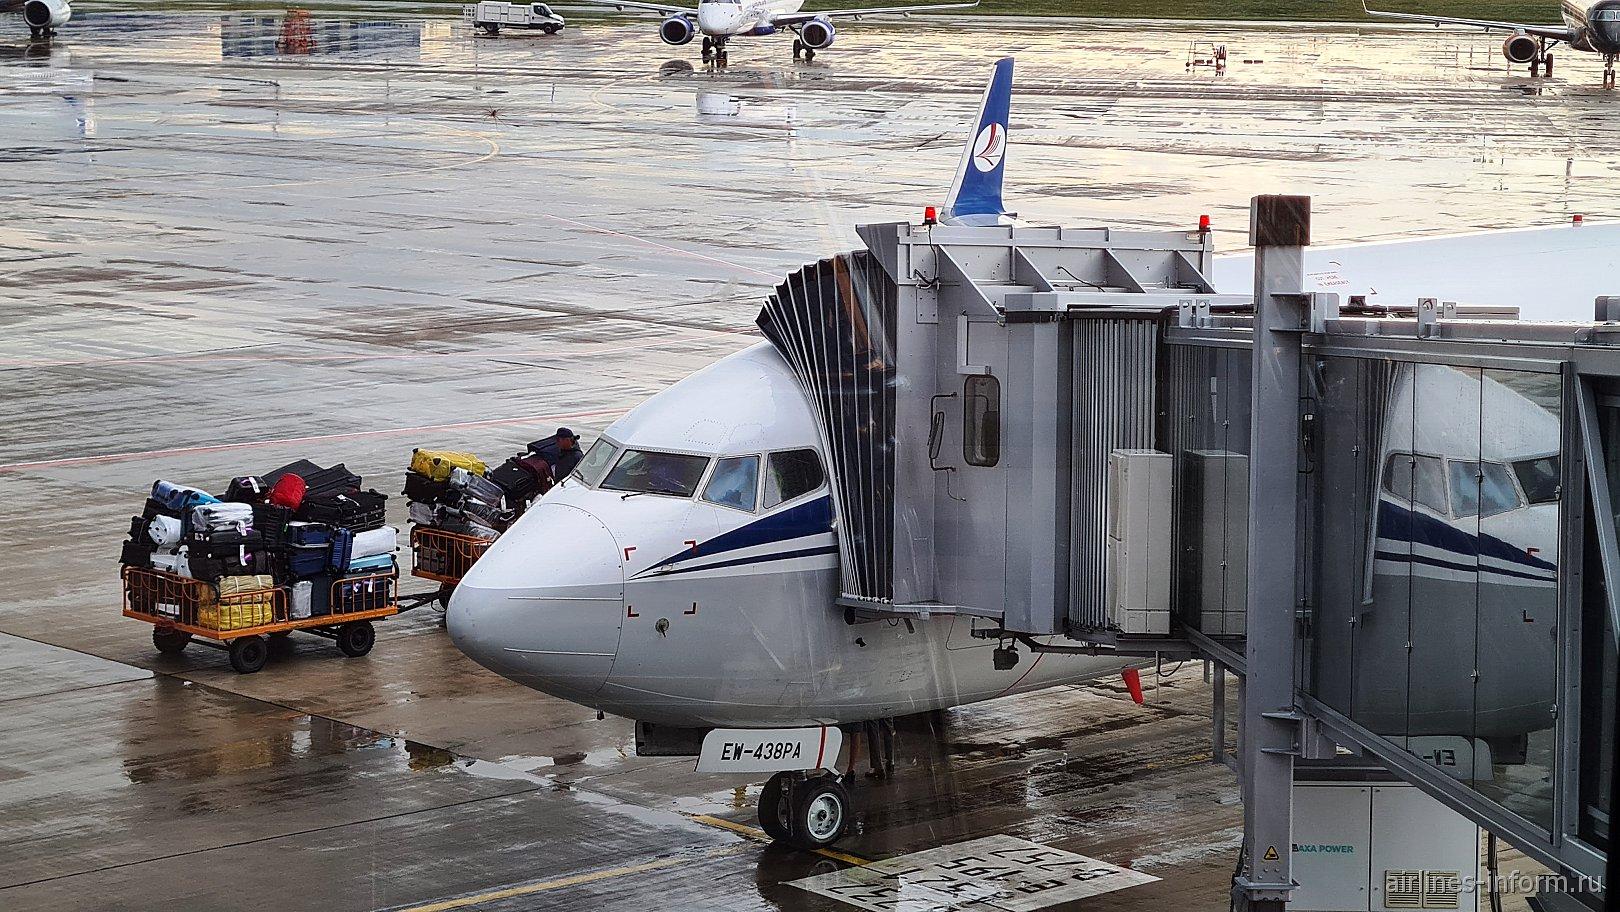 "Ростов-на-Дону (ROV) - Москва (SVO) - Минск (MSQ) - Стамбул (IST). Часть 2 из 2: ""MSQ-IST, Belavia, Boeing 737-800, класс бизнес"""